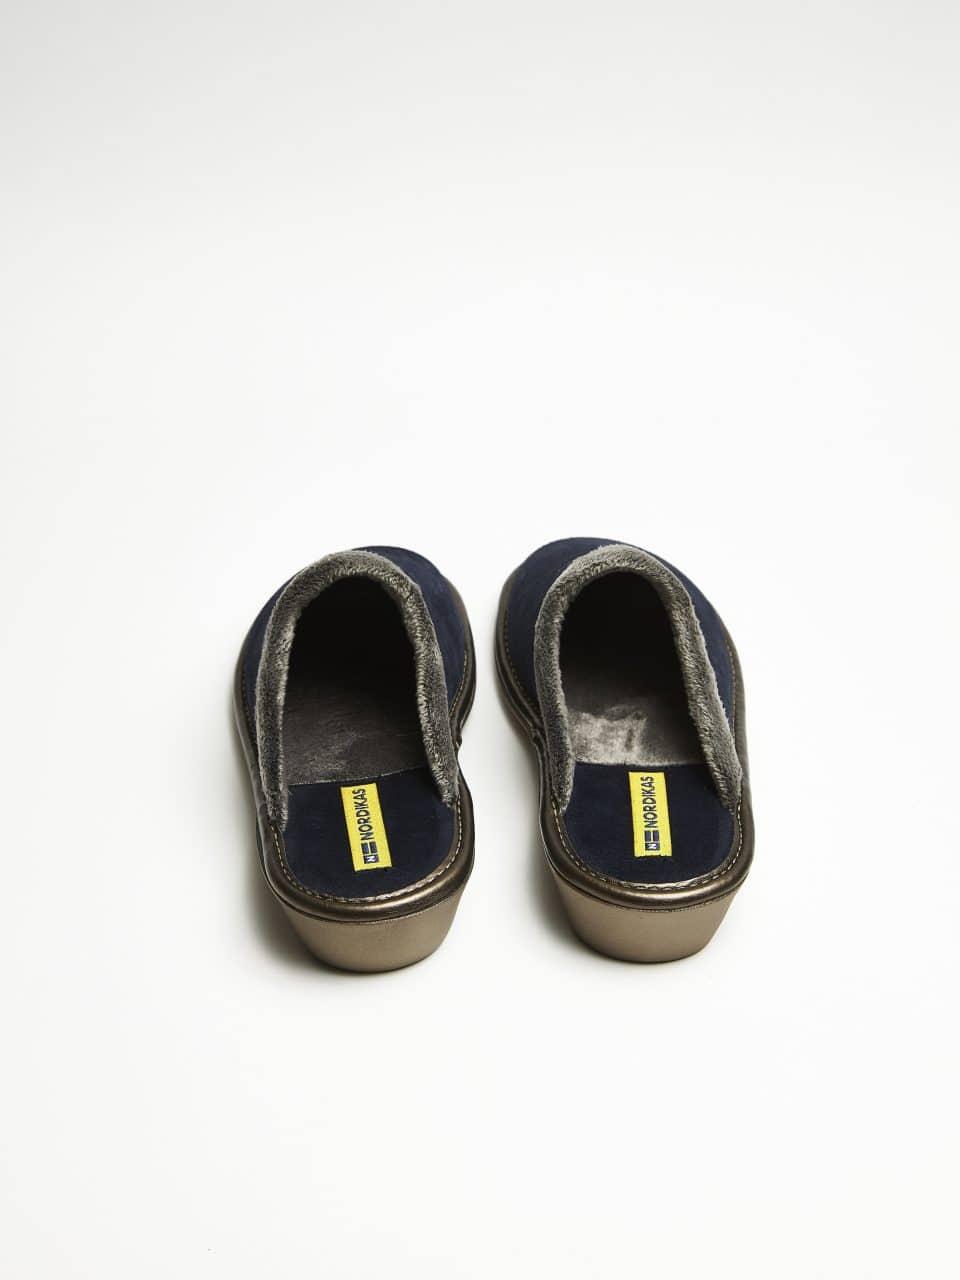 NORDIKAS AFELPADO MARINO CHINELA MUJER Marcas en Loyna Shoes